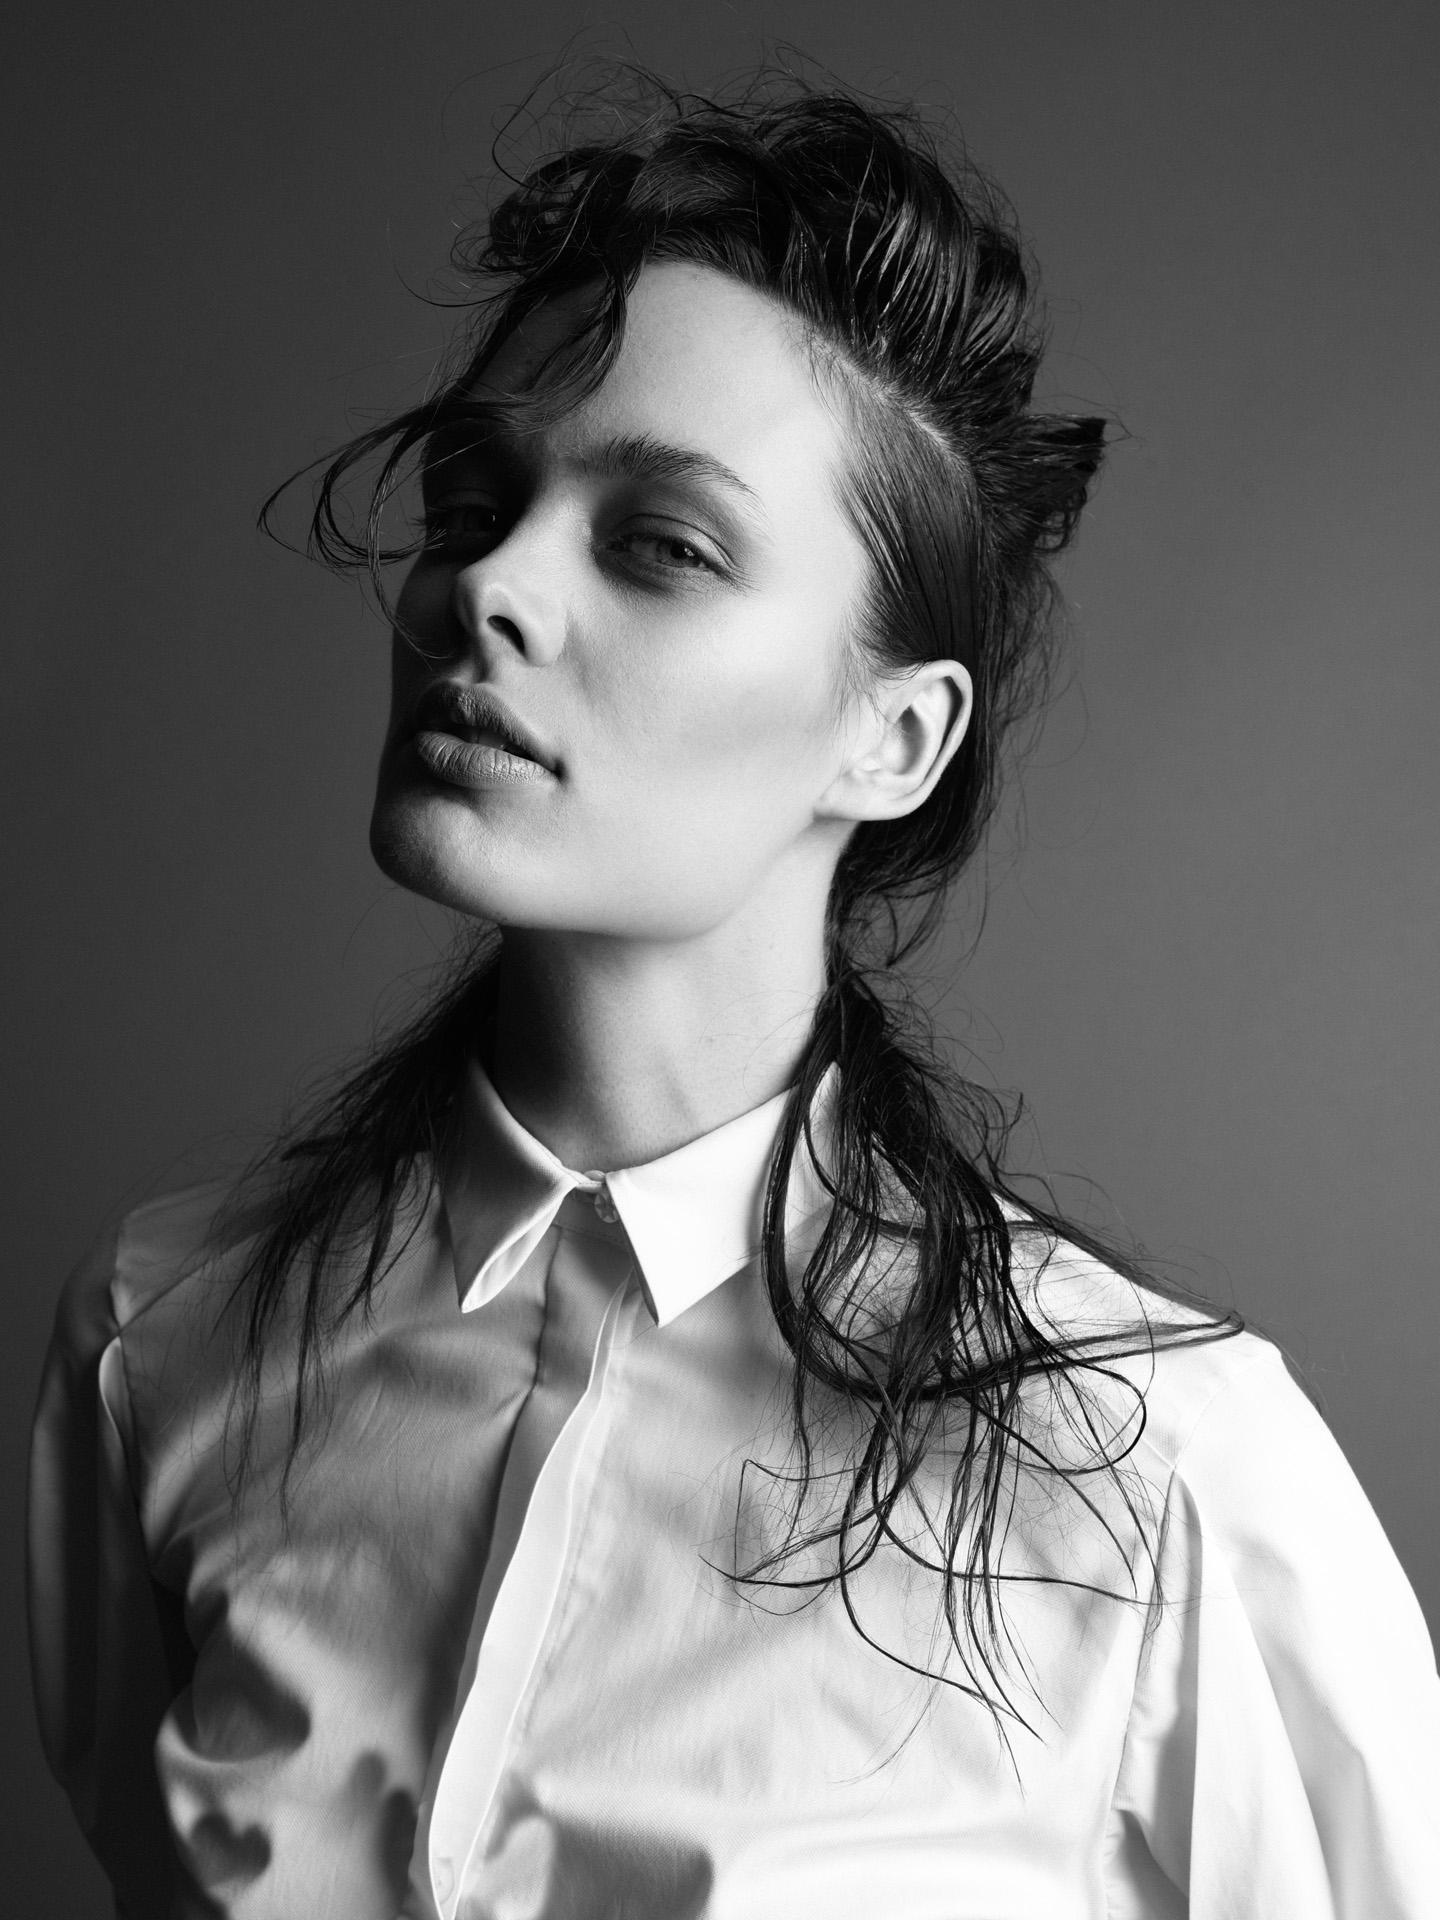 Roberto Aguilar_Photographer_Insp-Youth-Ellen-look1-day2_0056.jpg